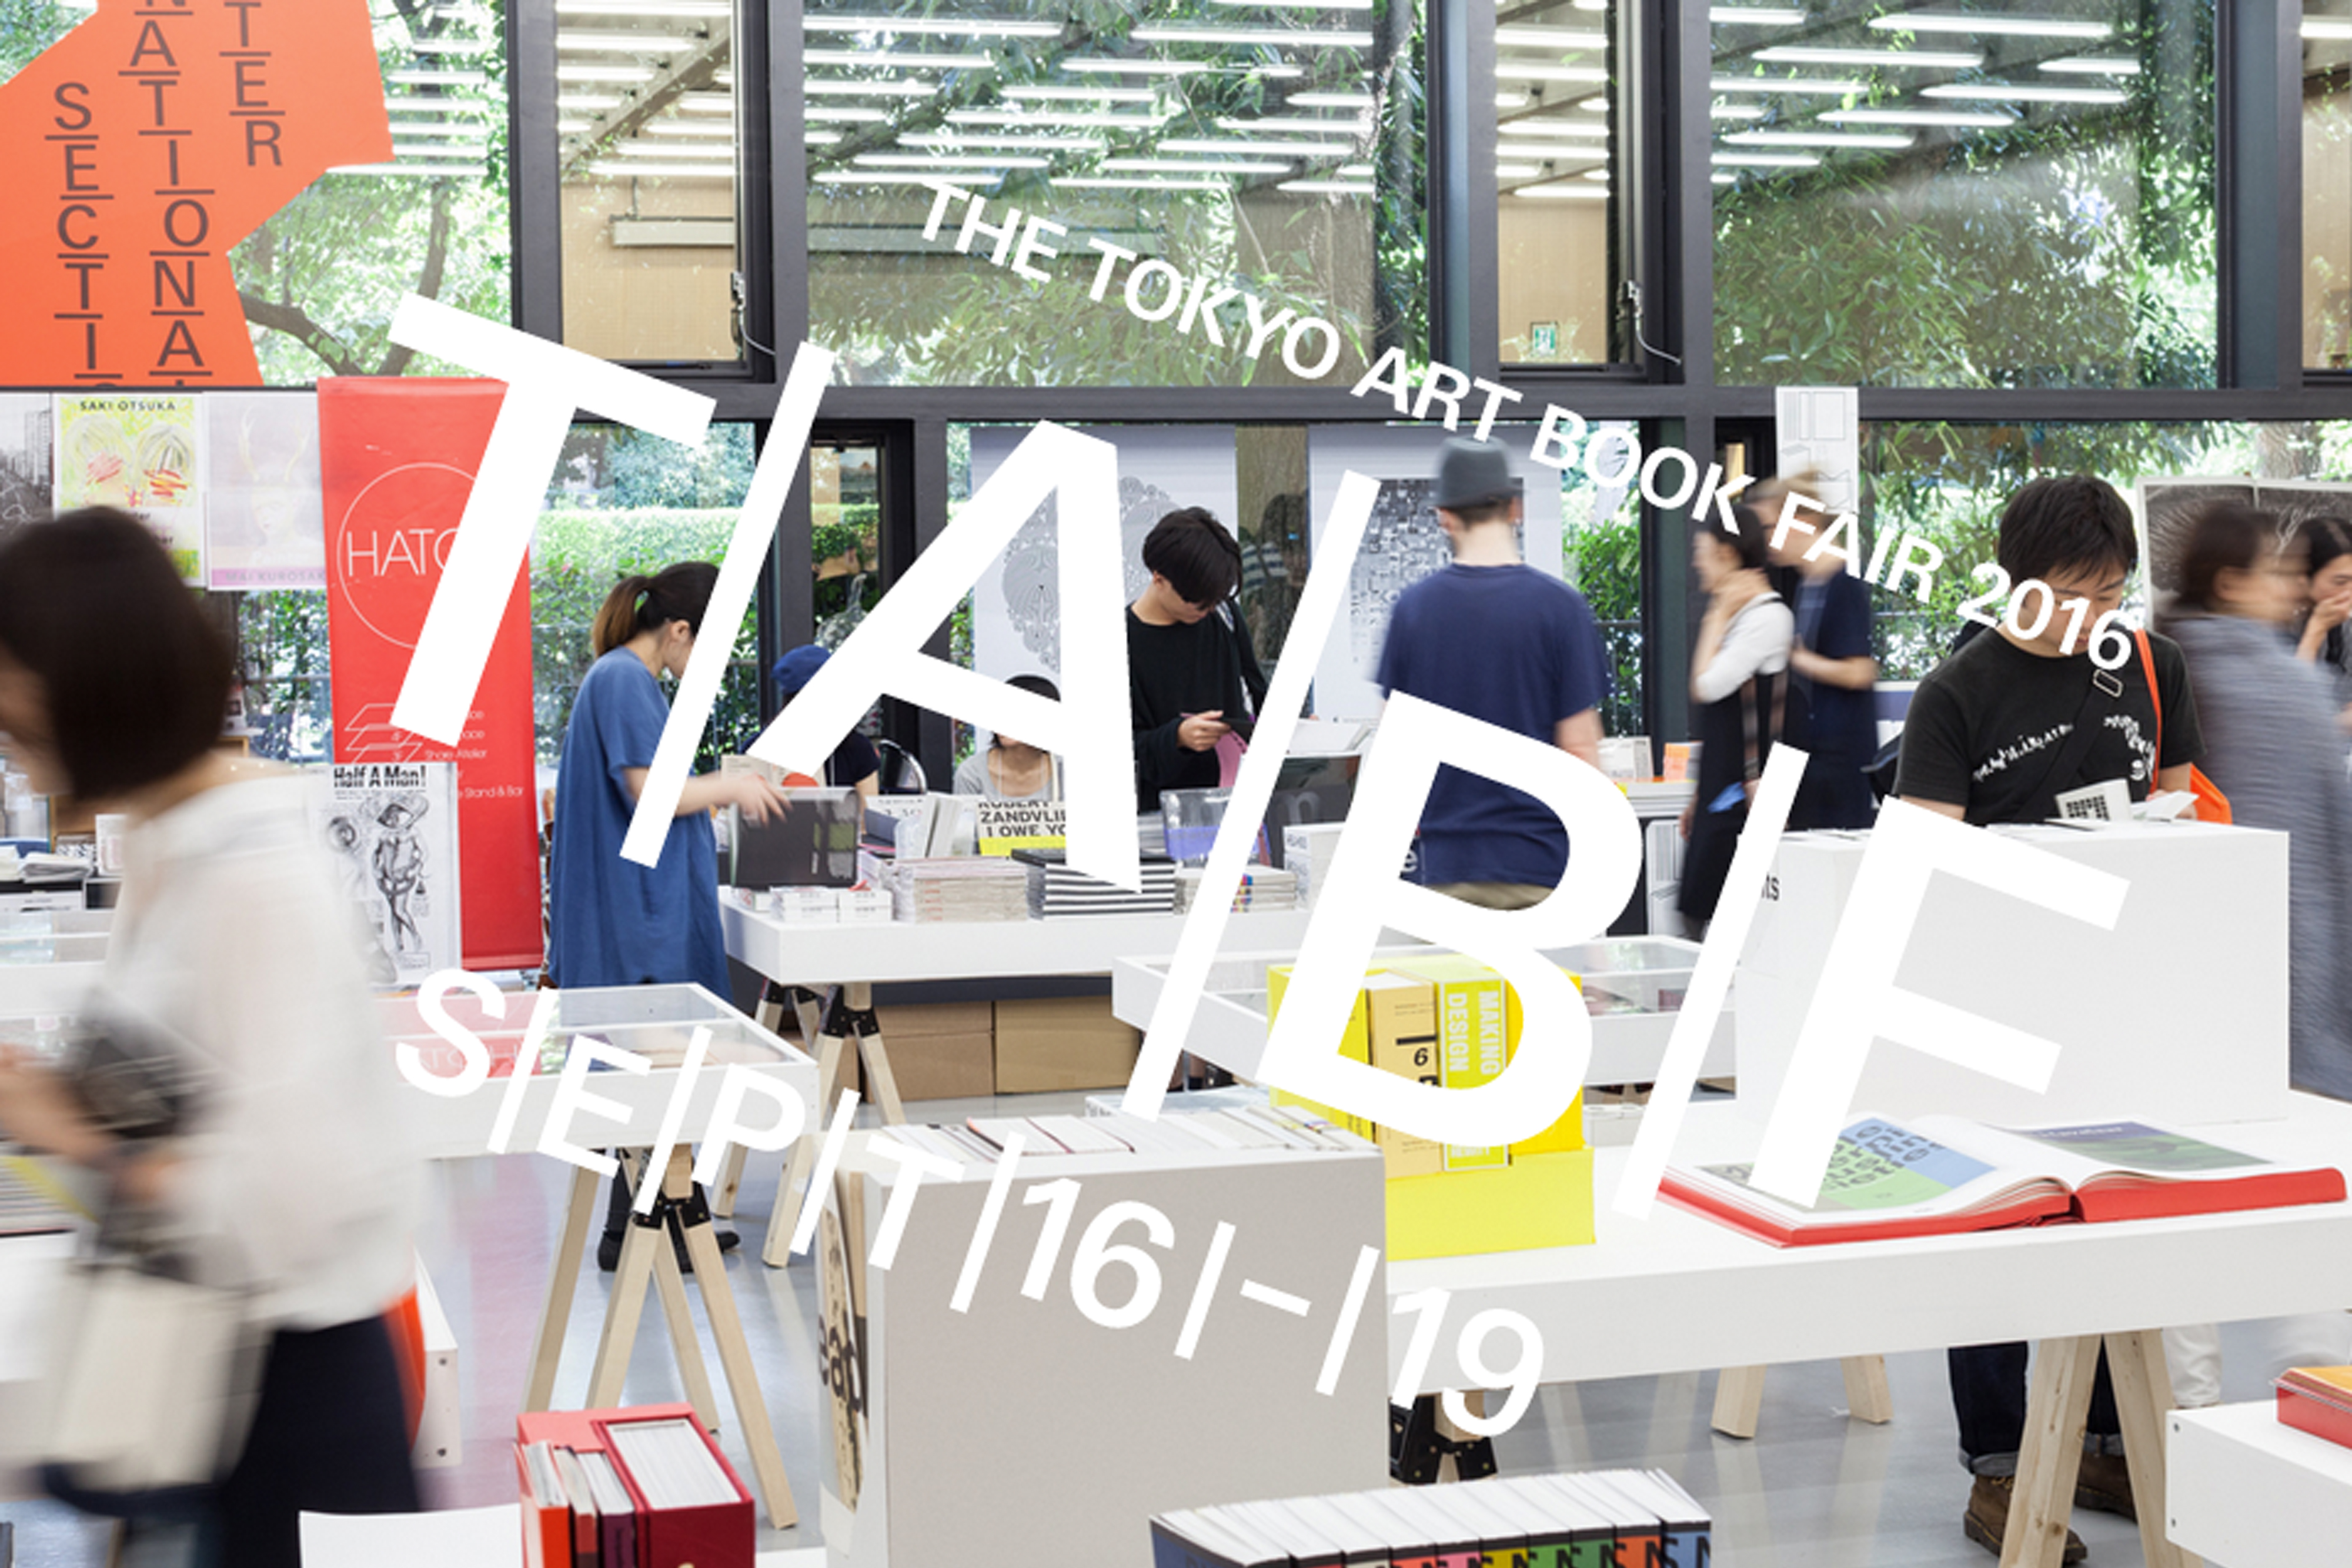 tokyoartbookfair_1